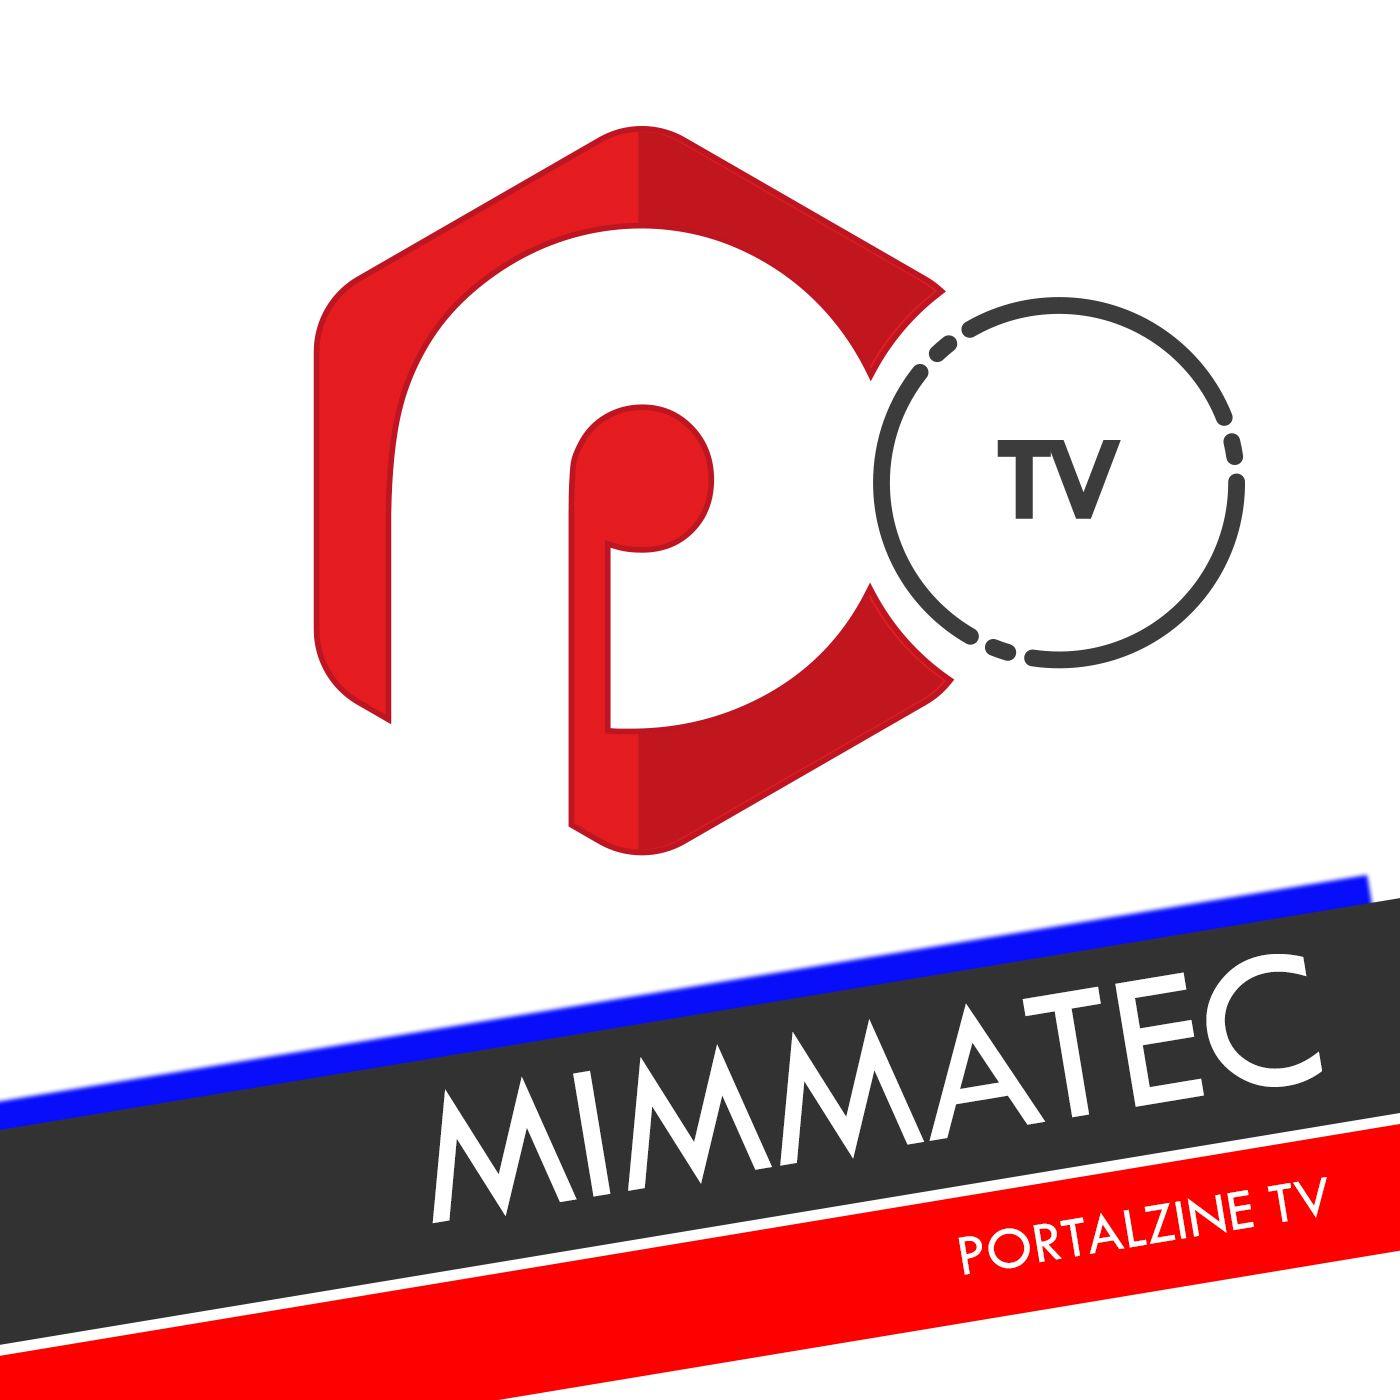 <![CDATA[mimmaTEC.TV - Foto, Video, Audio [HD]]]>